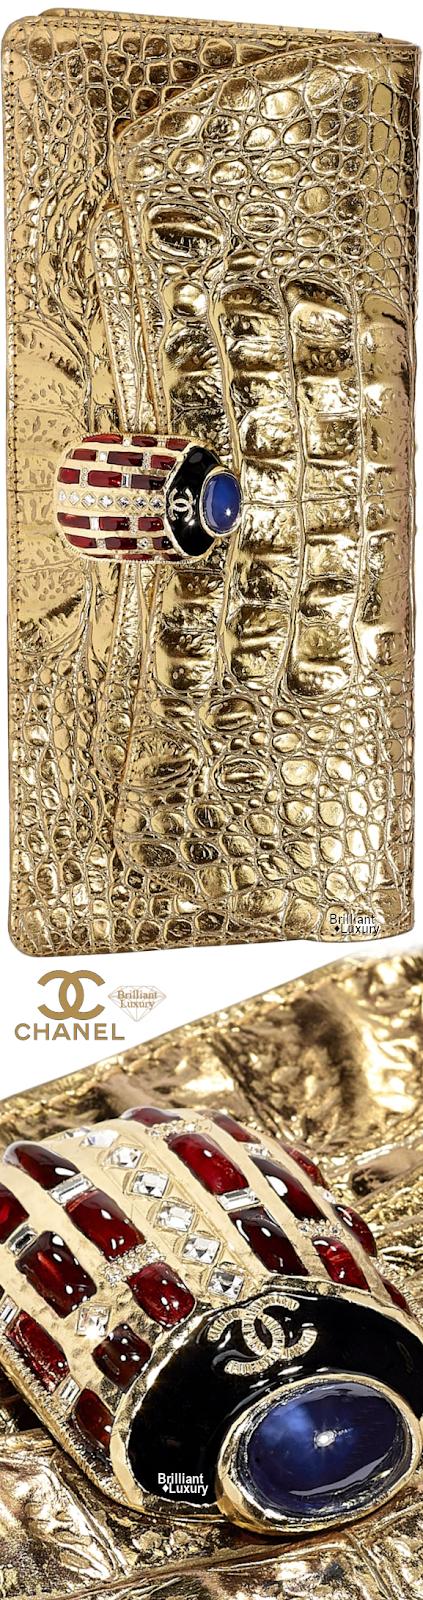 Brilliant Luxury♦Chanel Metallic Crocodile Embossed Calfskin Evening Clutch #gold